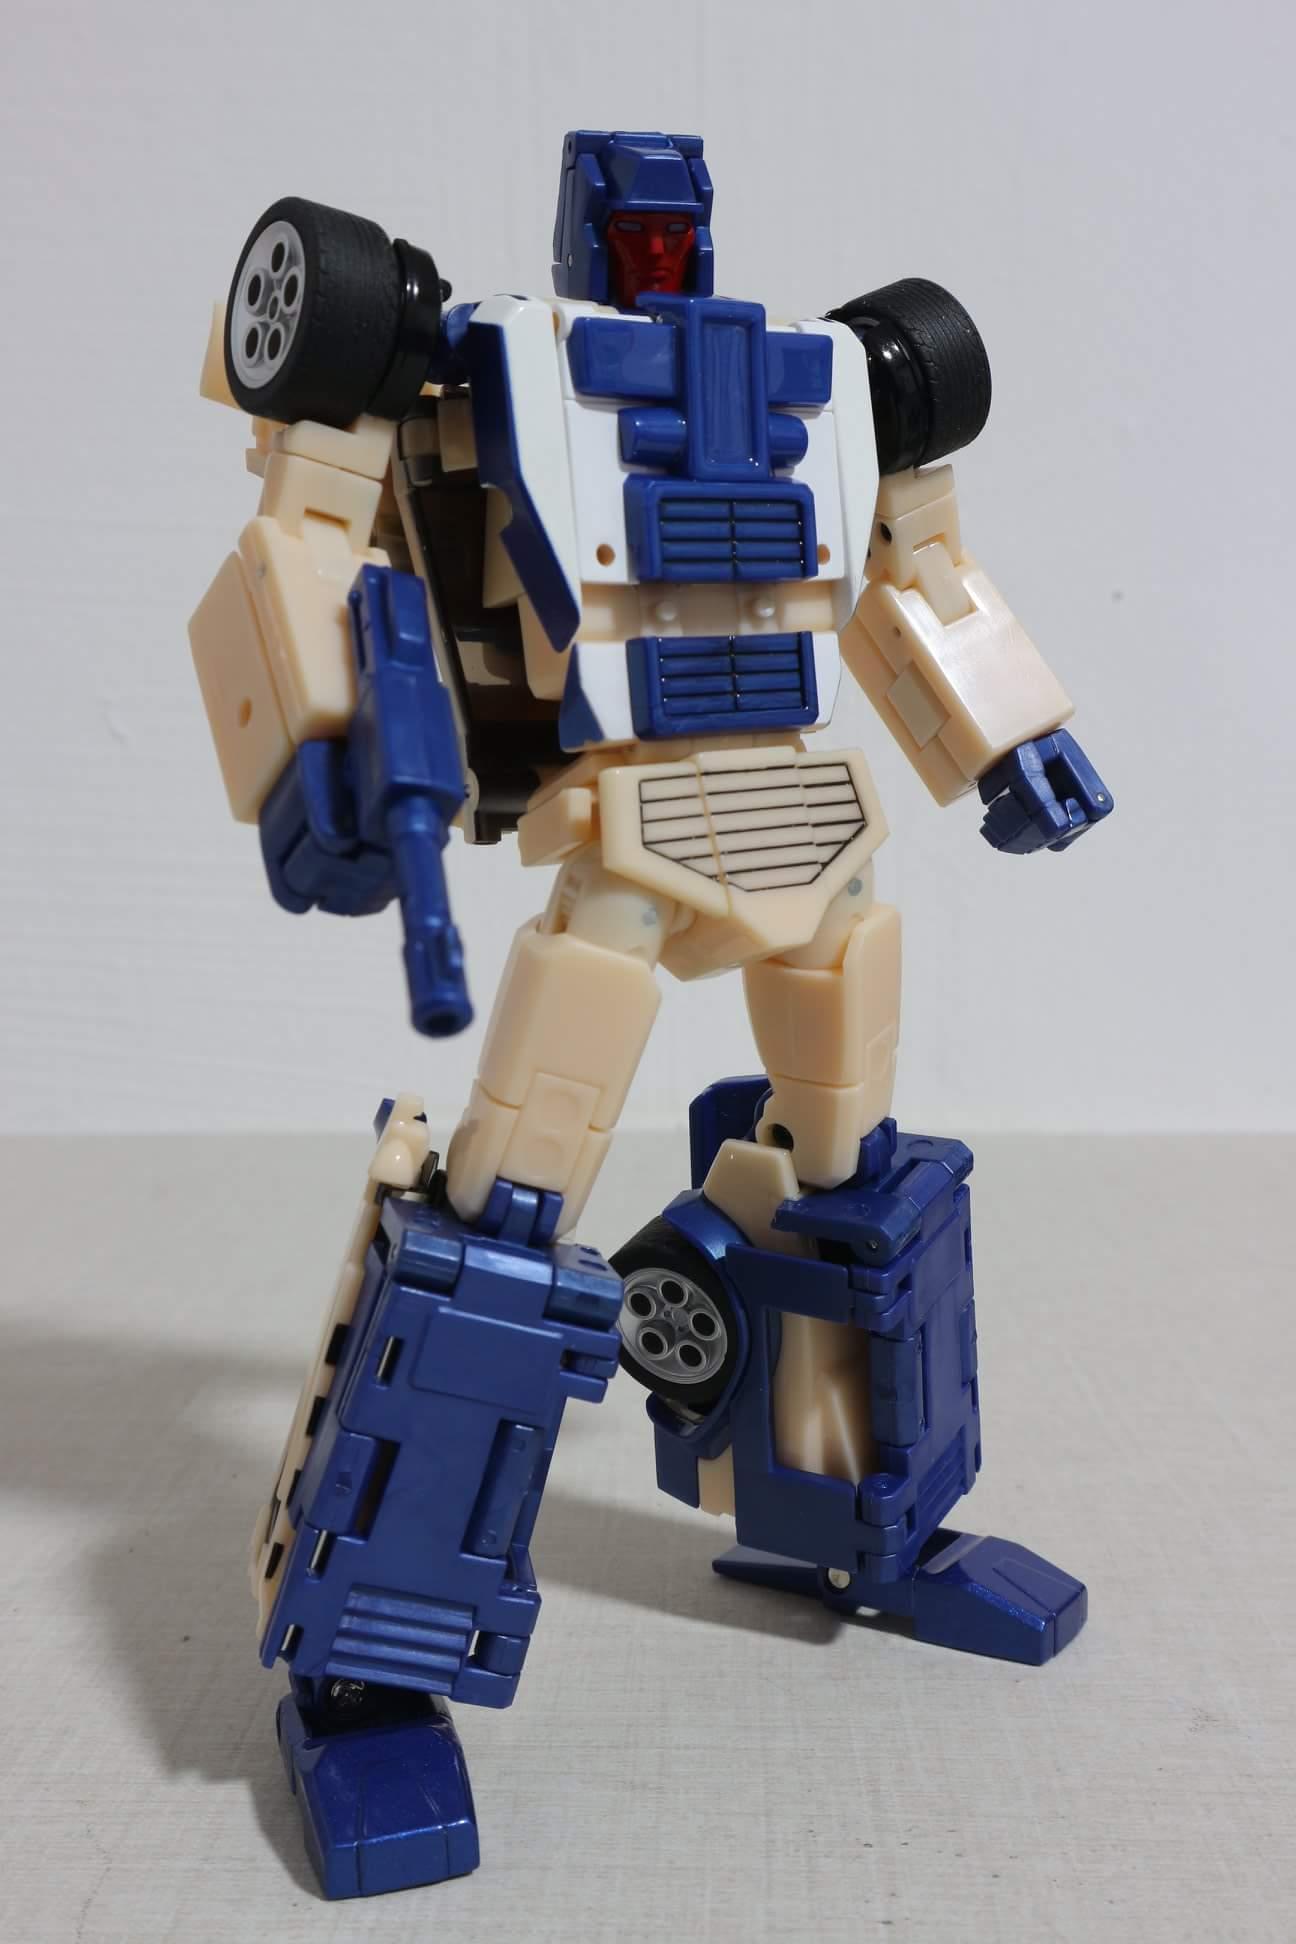 [X-Transbots] Produit Tiers - Jouets Berserkars forme Monolith (MX-XIII à MX-VII) - aka Stunticons forme Menasor/Menaseur - Page 2 E6Y2E17a_o